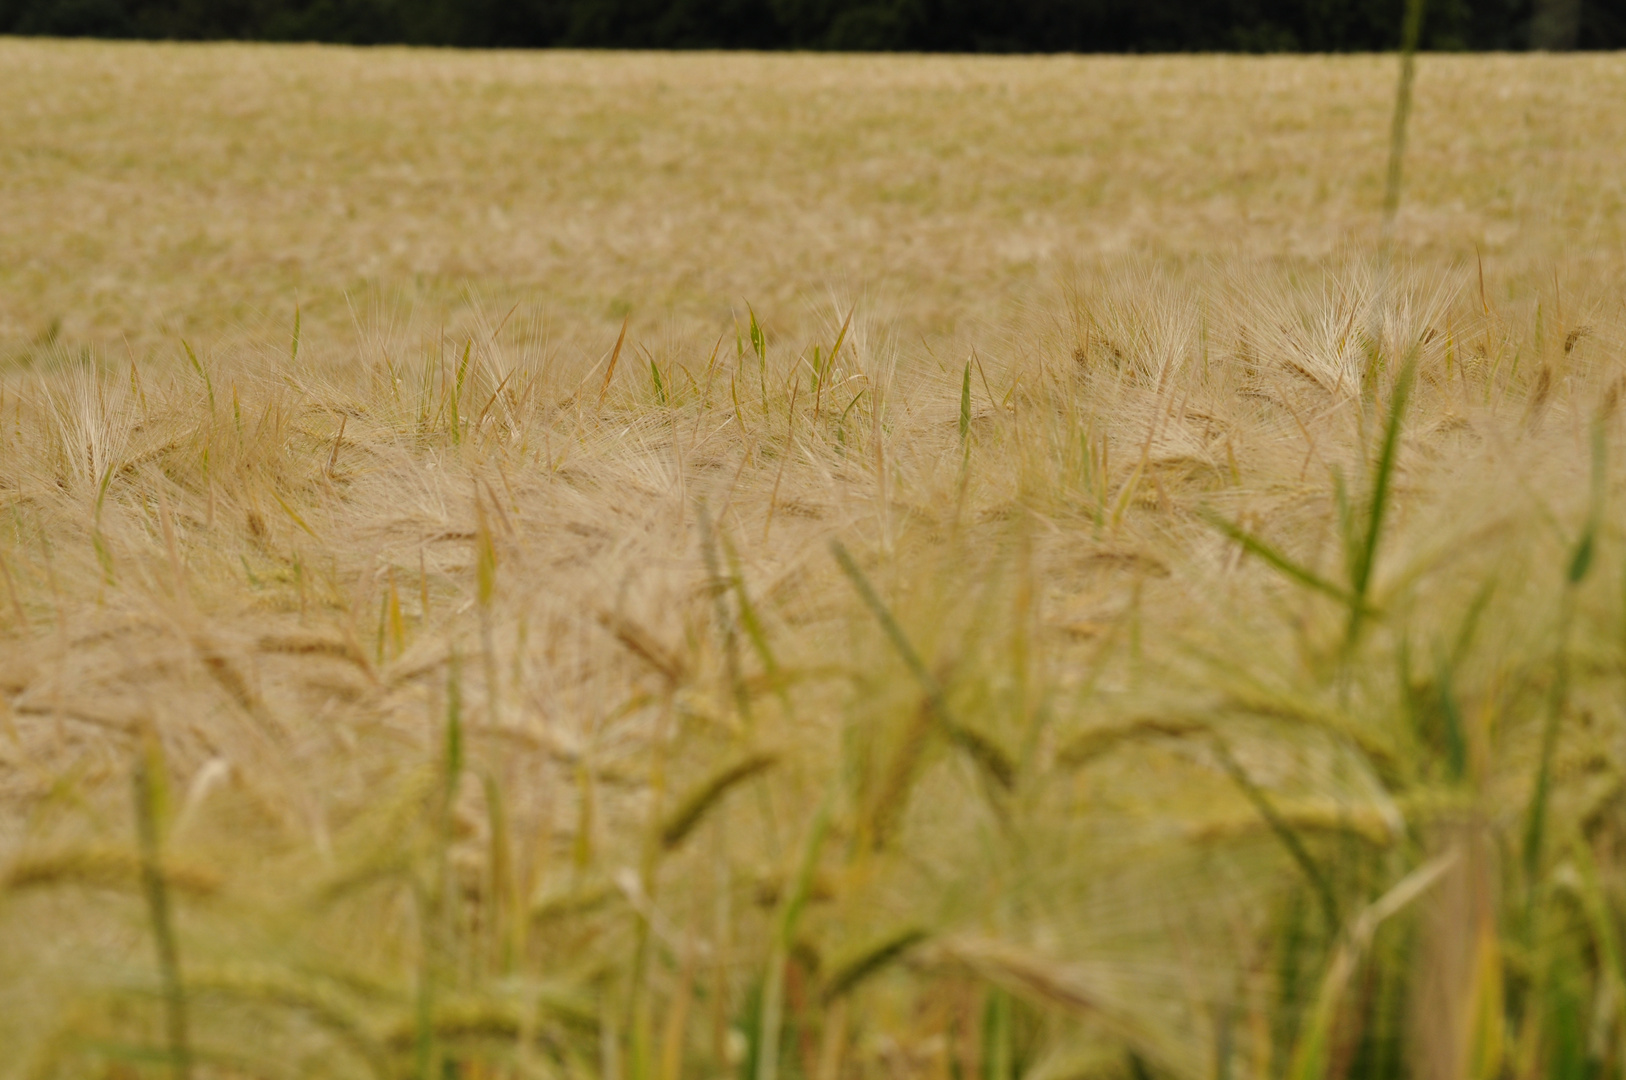 Felder der Natur